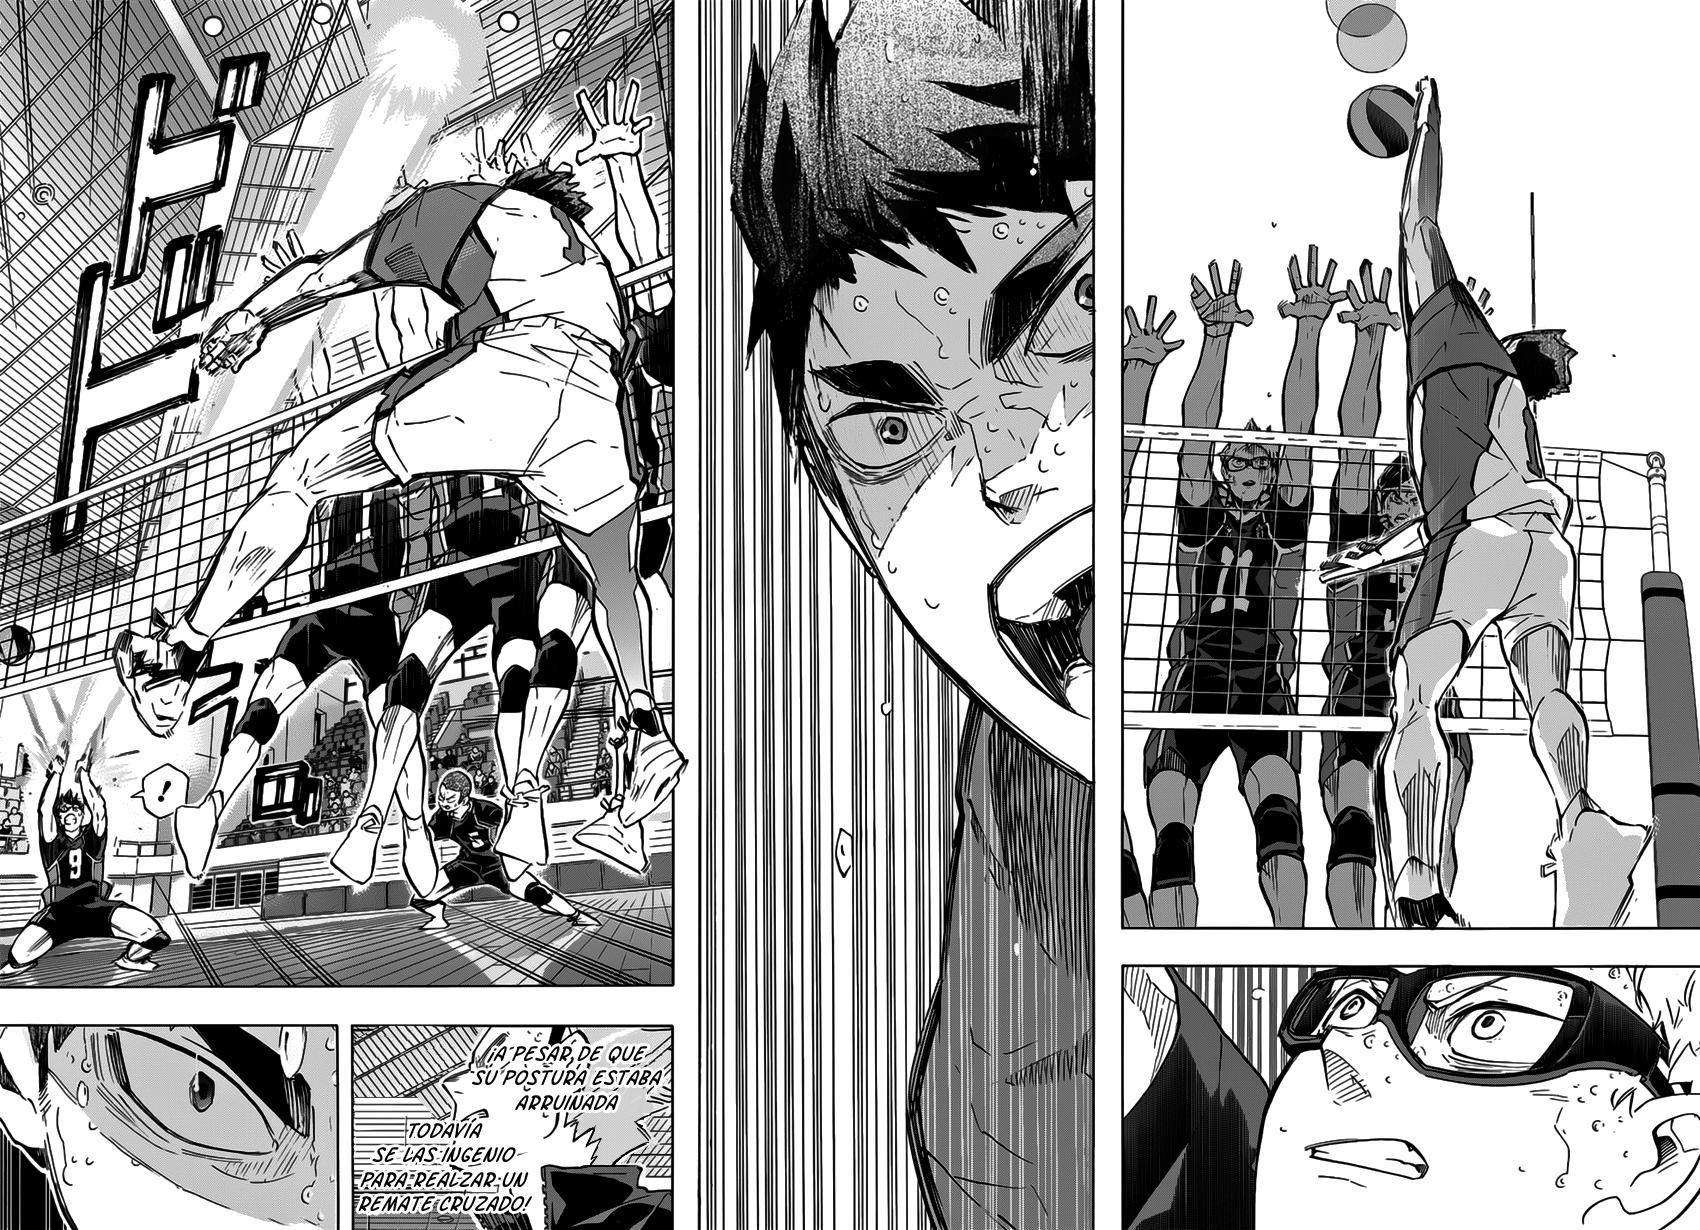 https://c5.ninemanga.com/es_manga/10/10/435128/d6e46b0eb1419567f3623b8c761f9920.jpg Page 8